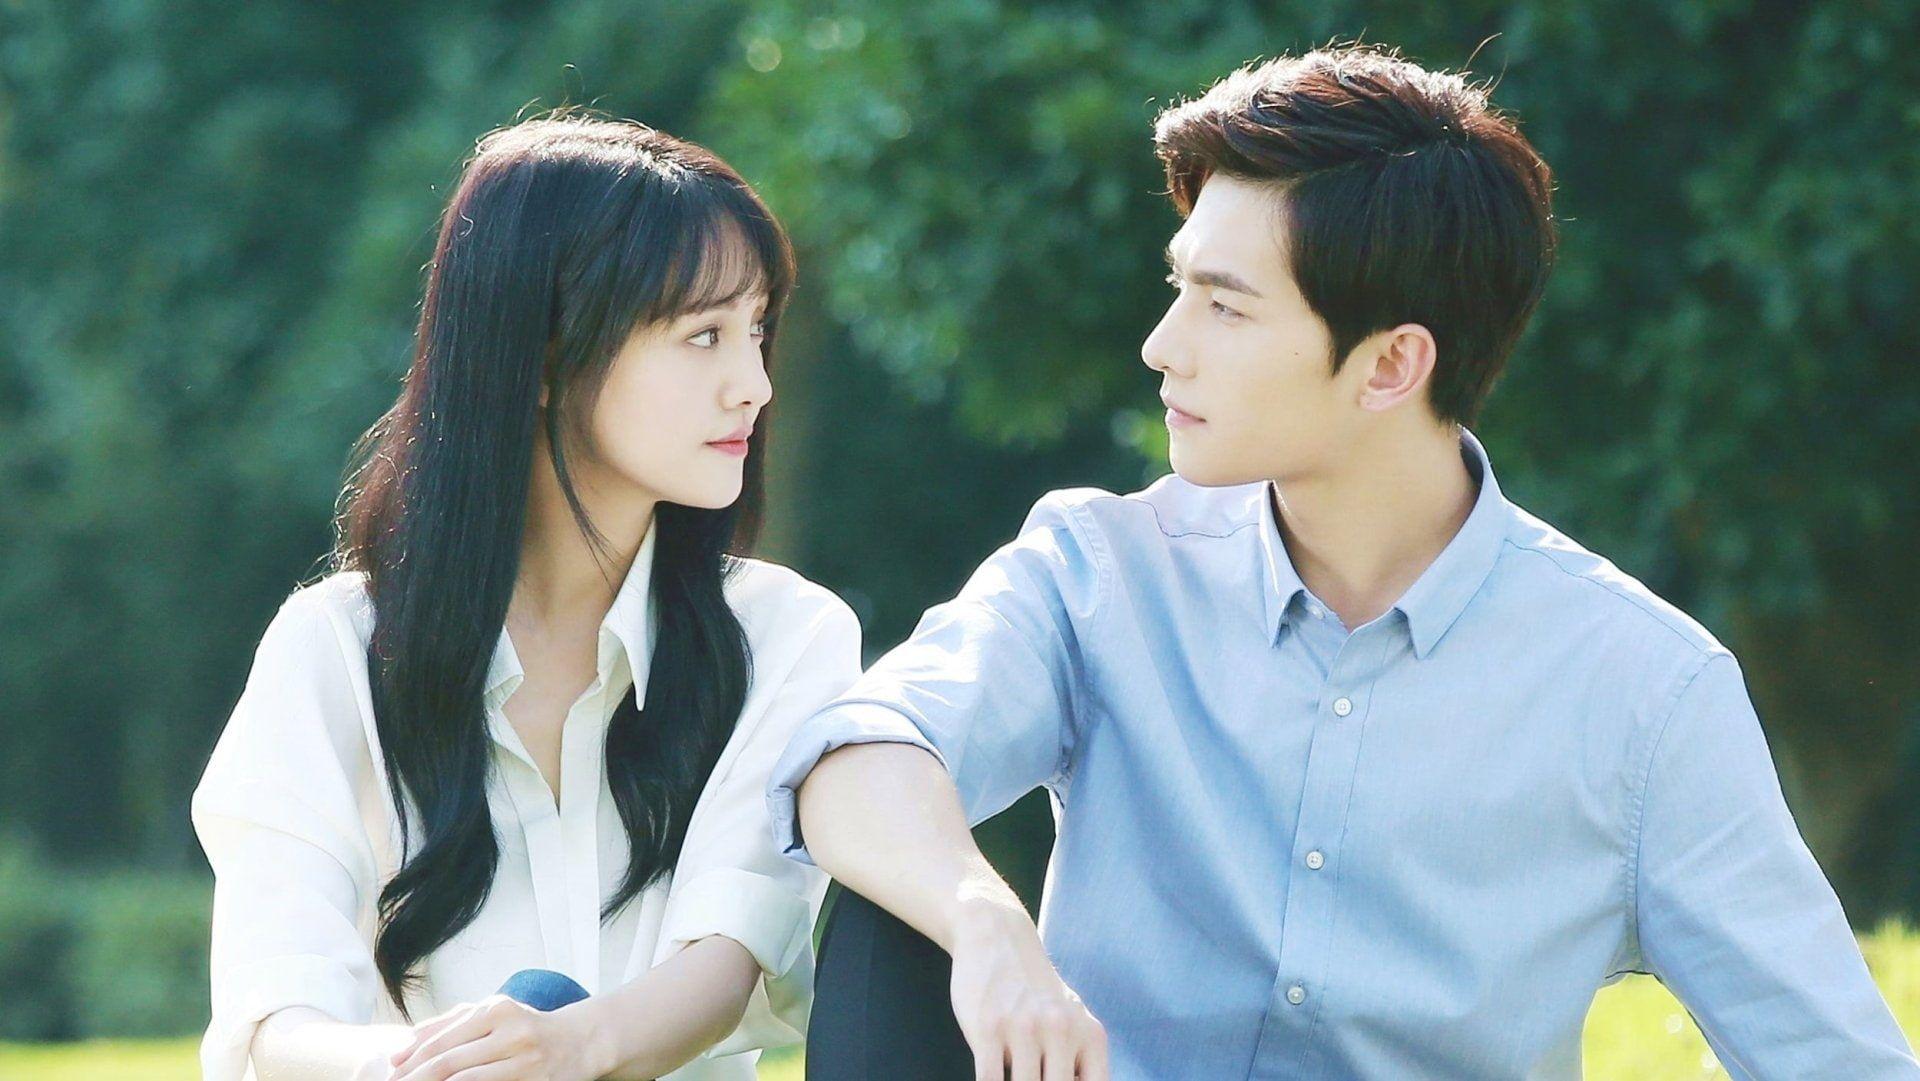 Tv Show Love O2o 1080p Wallpaper Hdwallpaper Desktop Cute Romance Tv Shows Drama